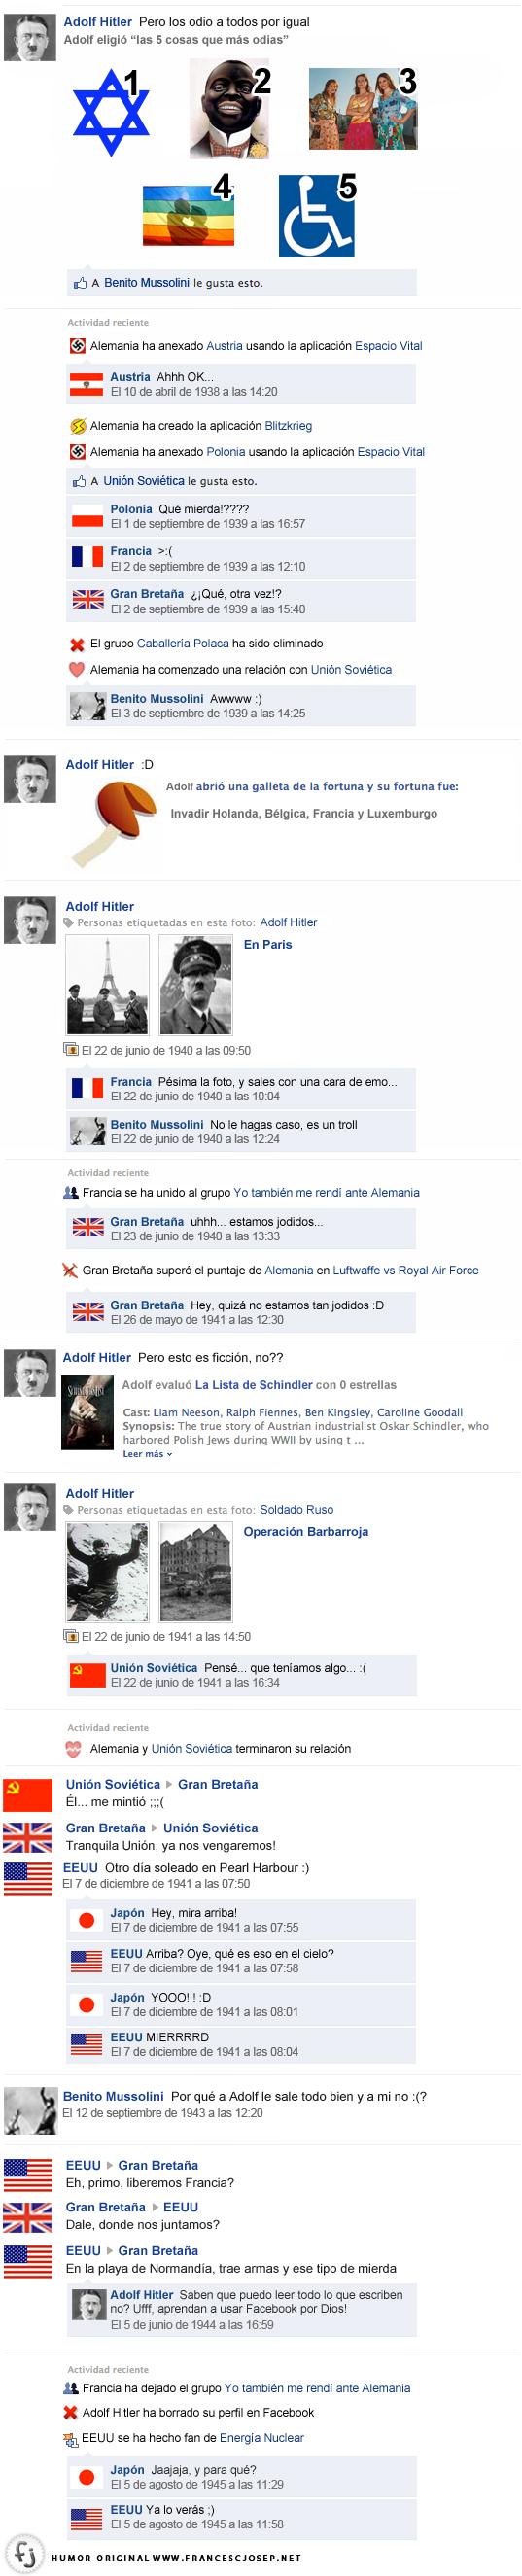 francescjosep.net - fb1936